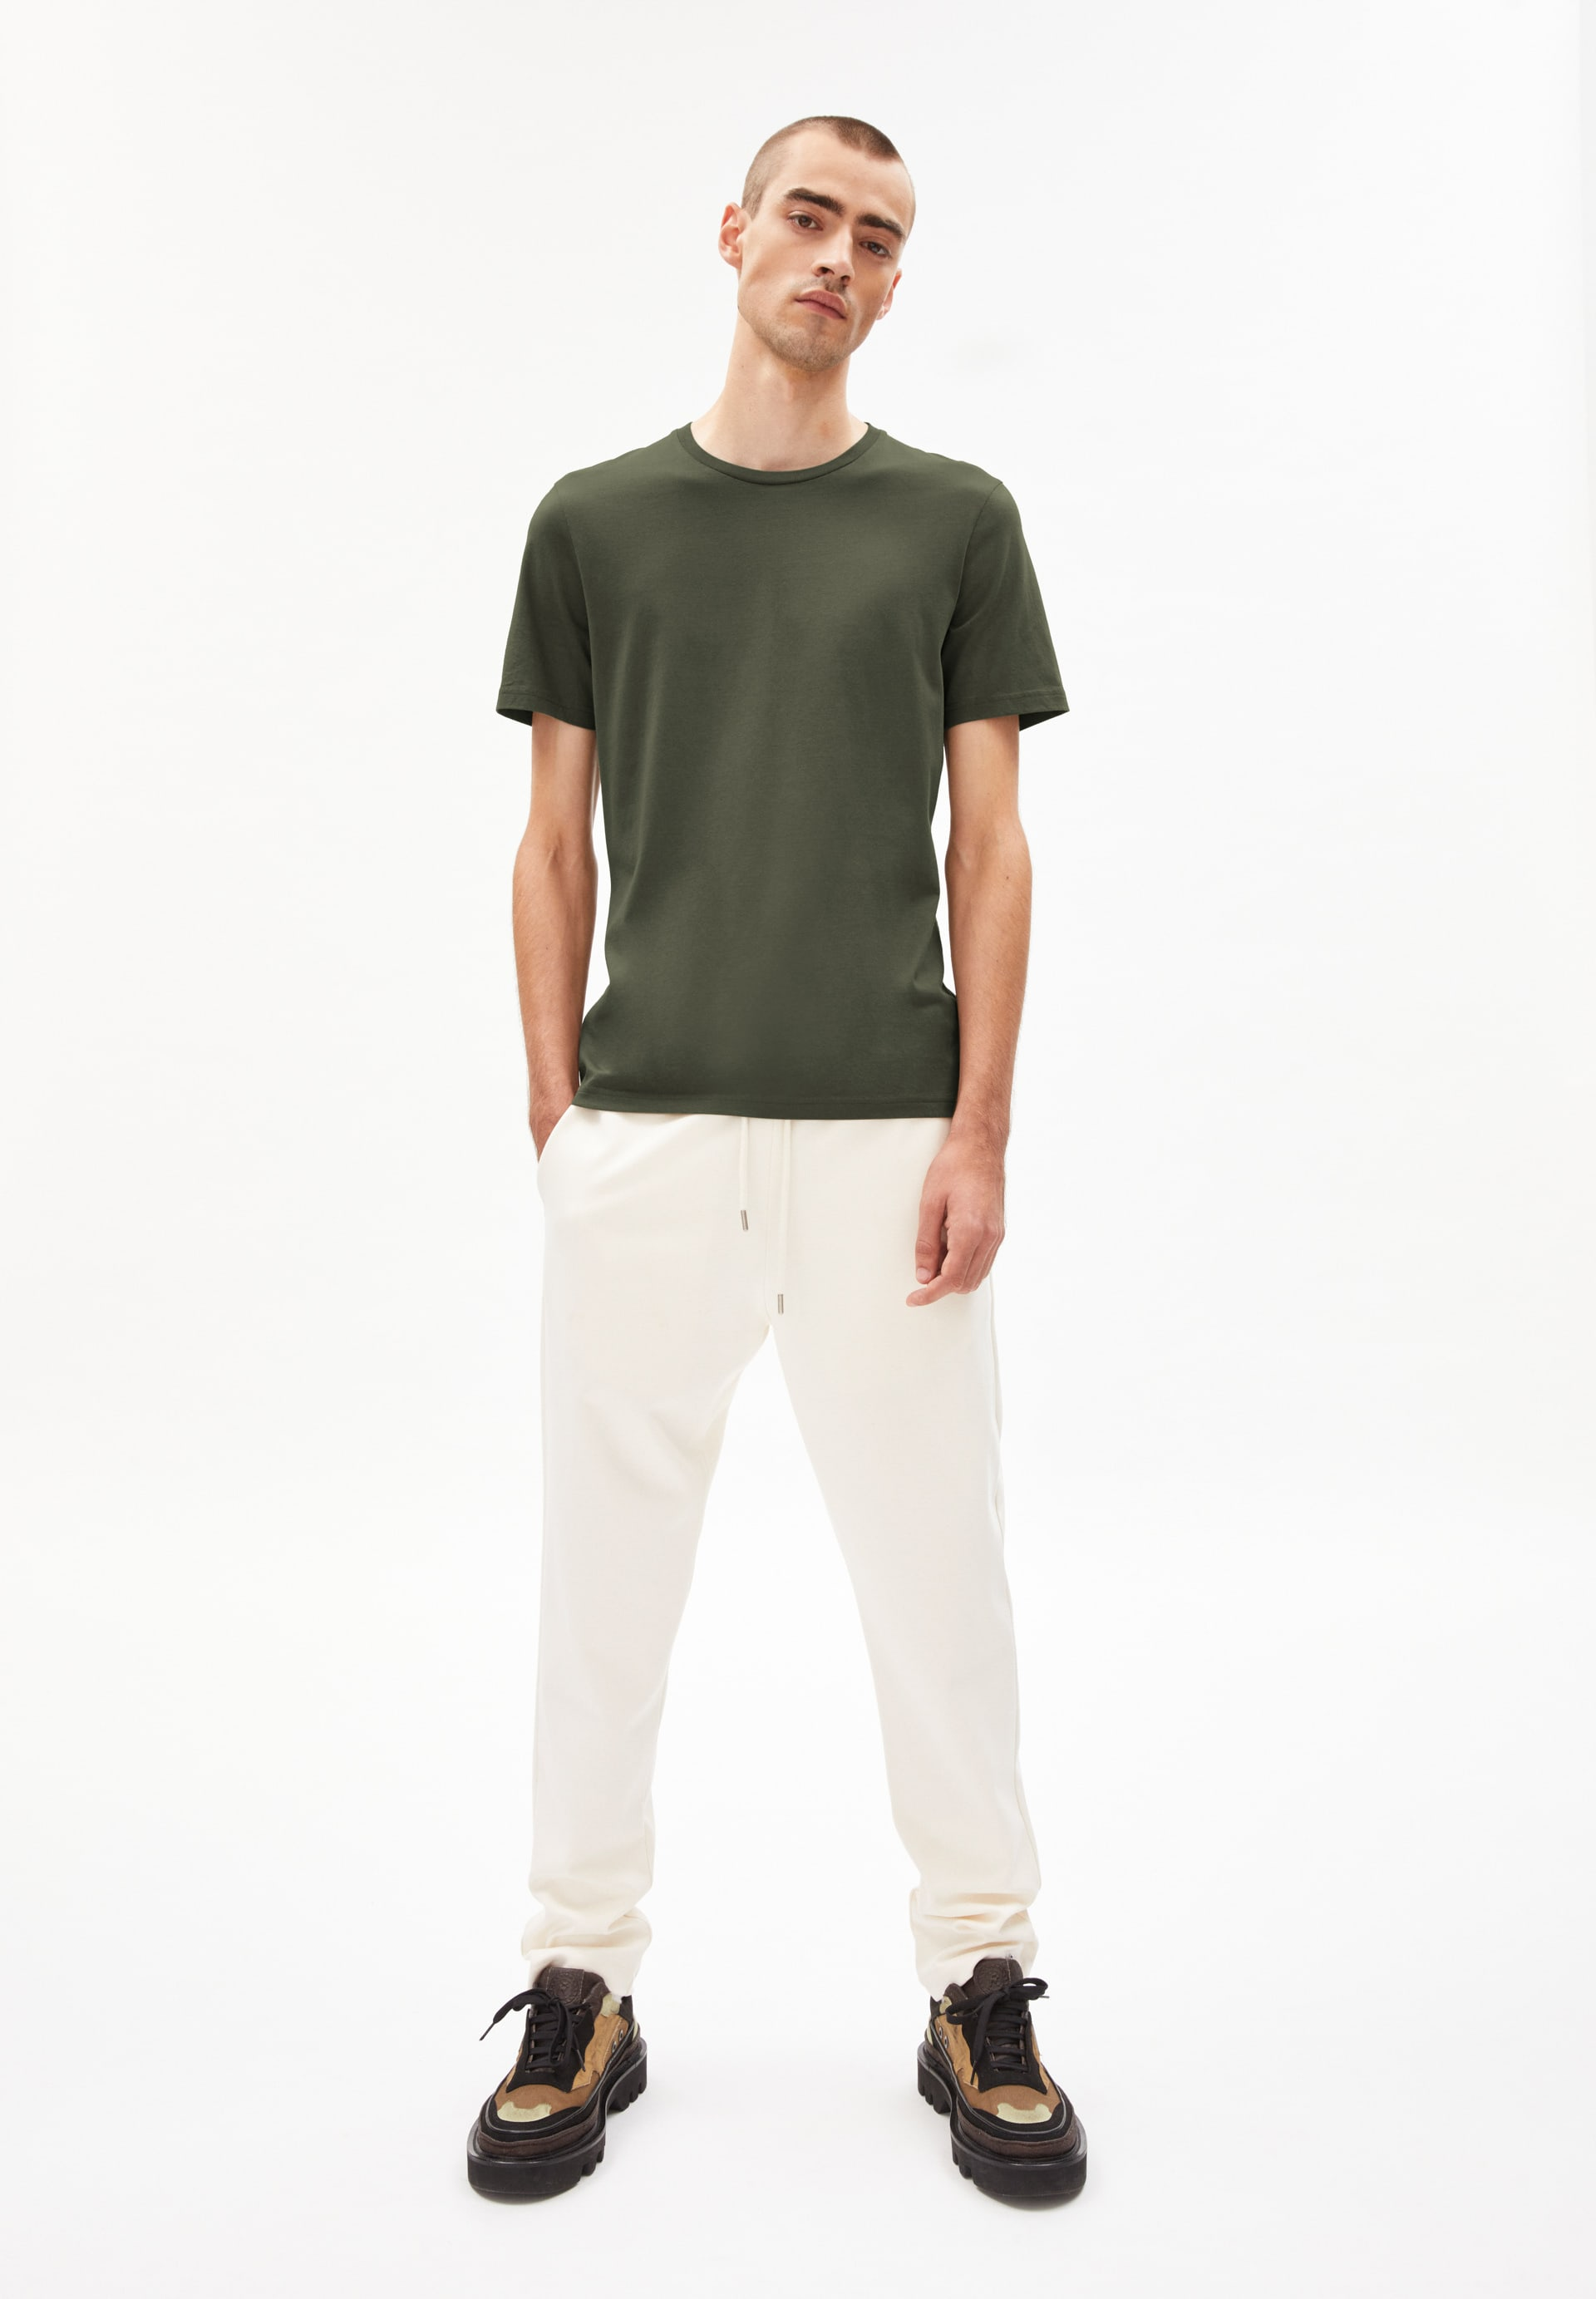 JAAMES T-shirt made of Organic Cotton